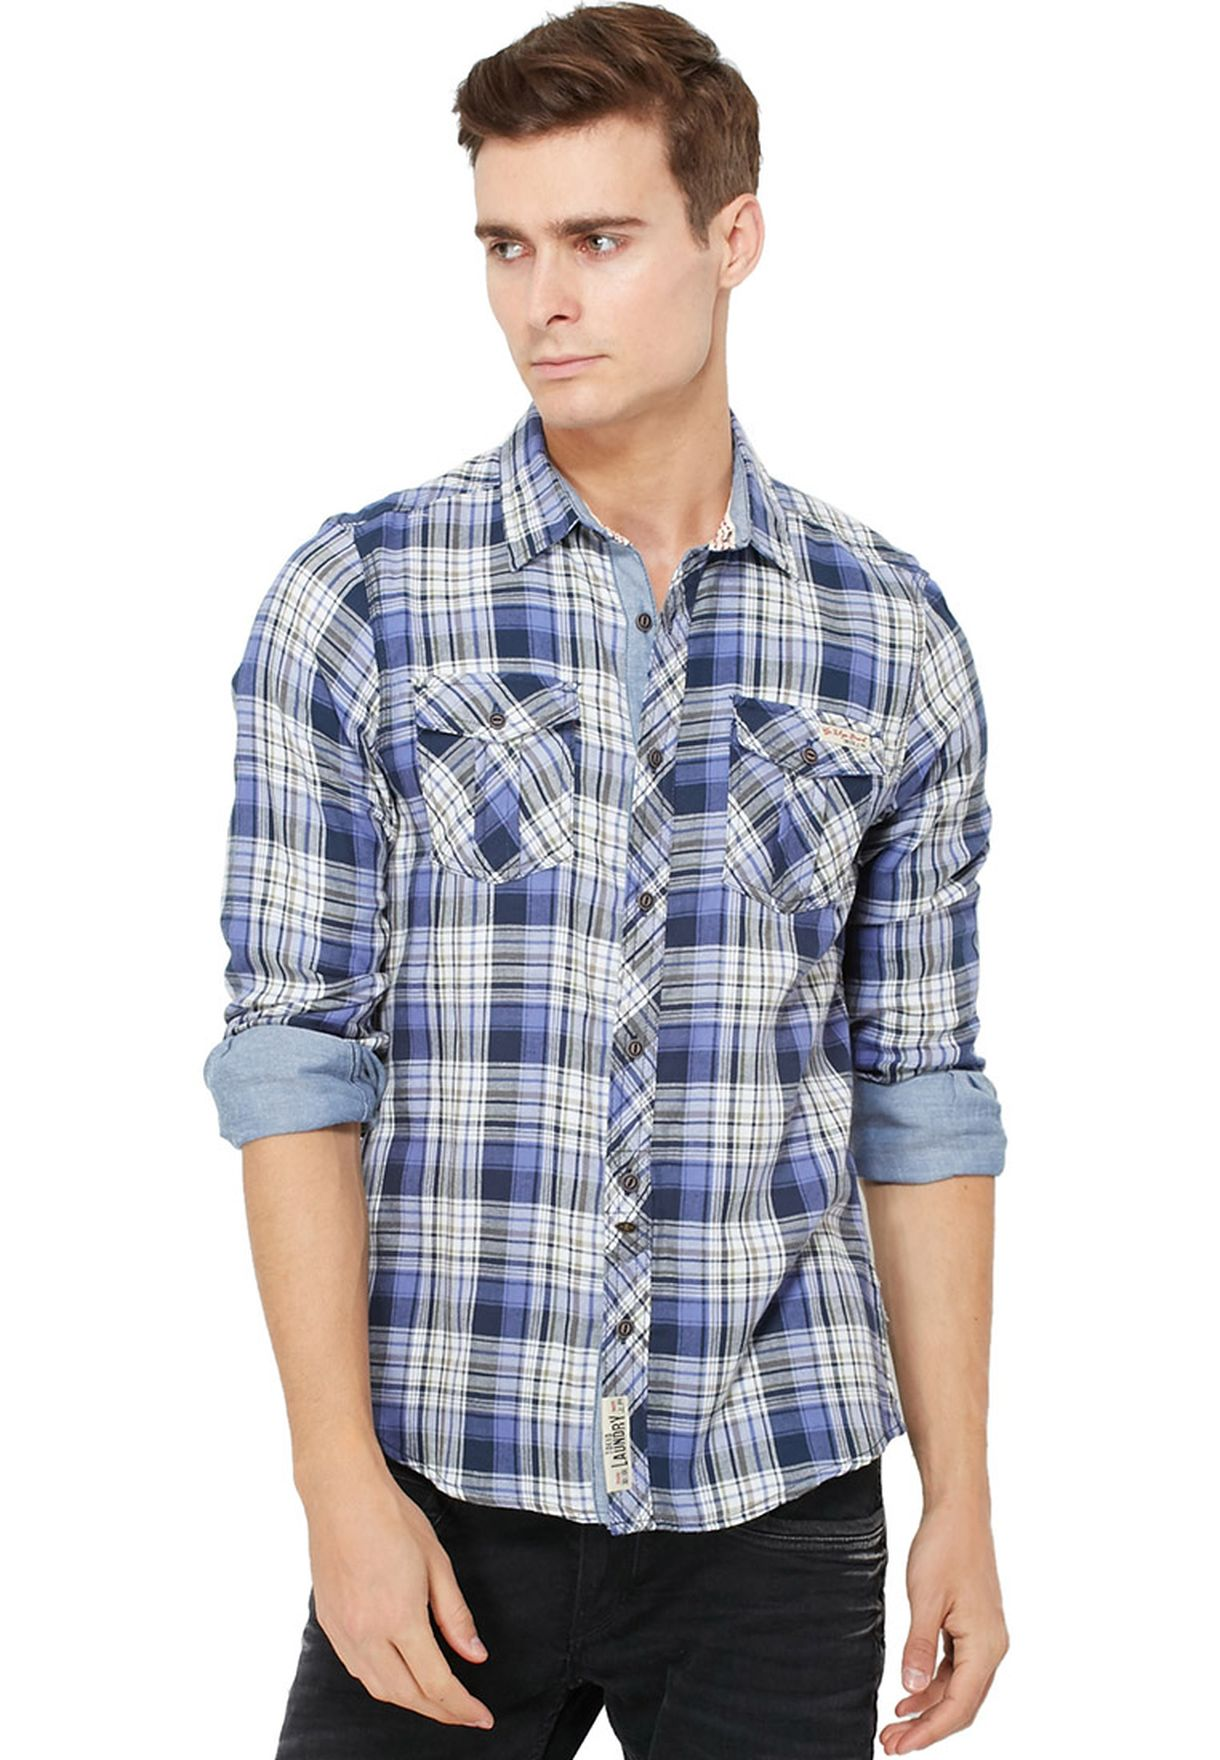 910babcae تسوق قميص كاروهات ماركة طوكيو لوندري لون متعدد الألوان في البحرين ...